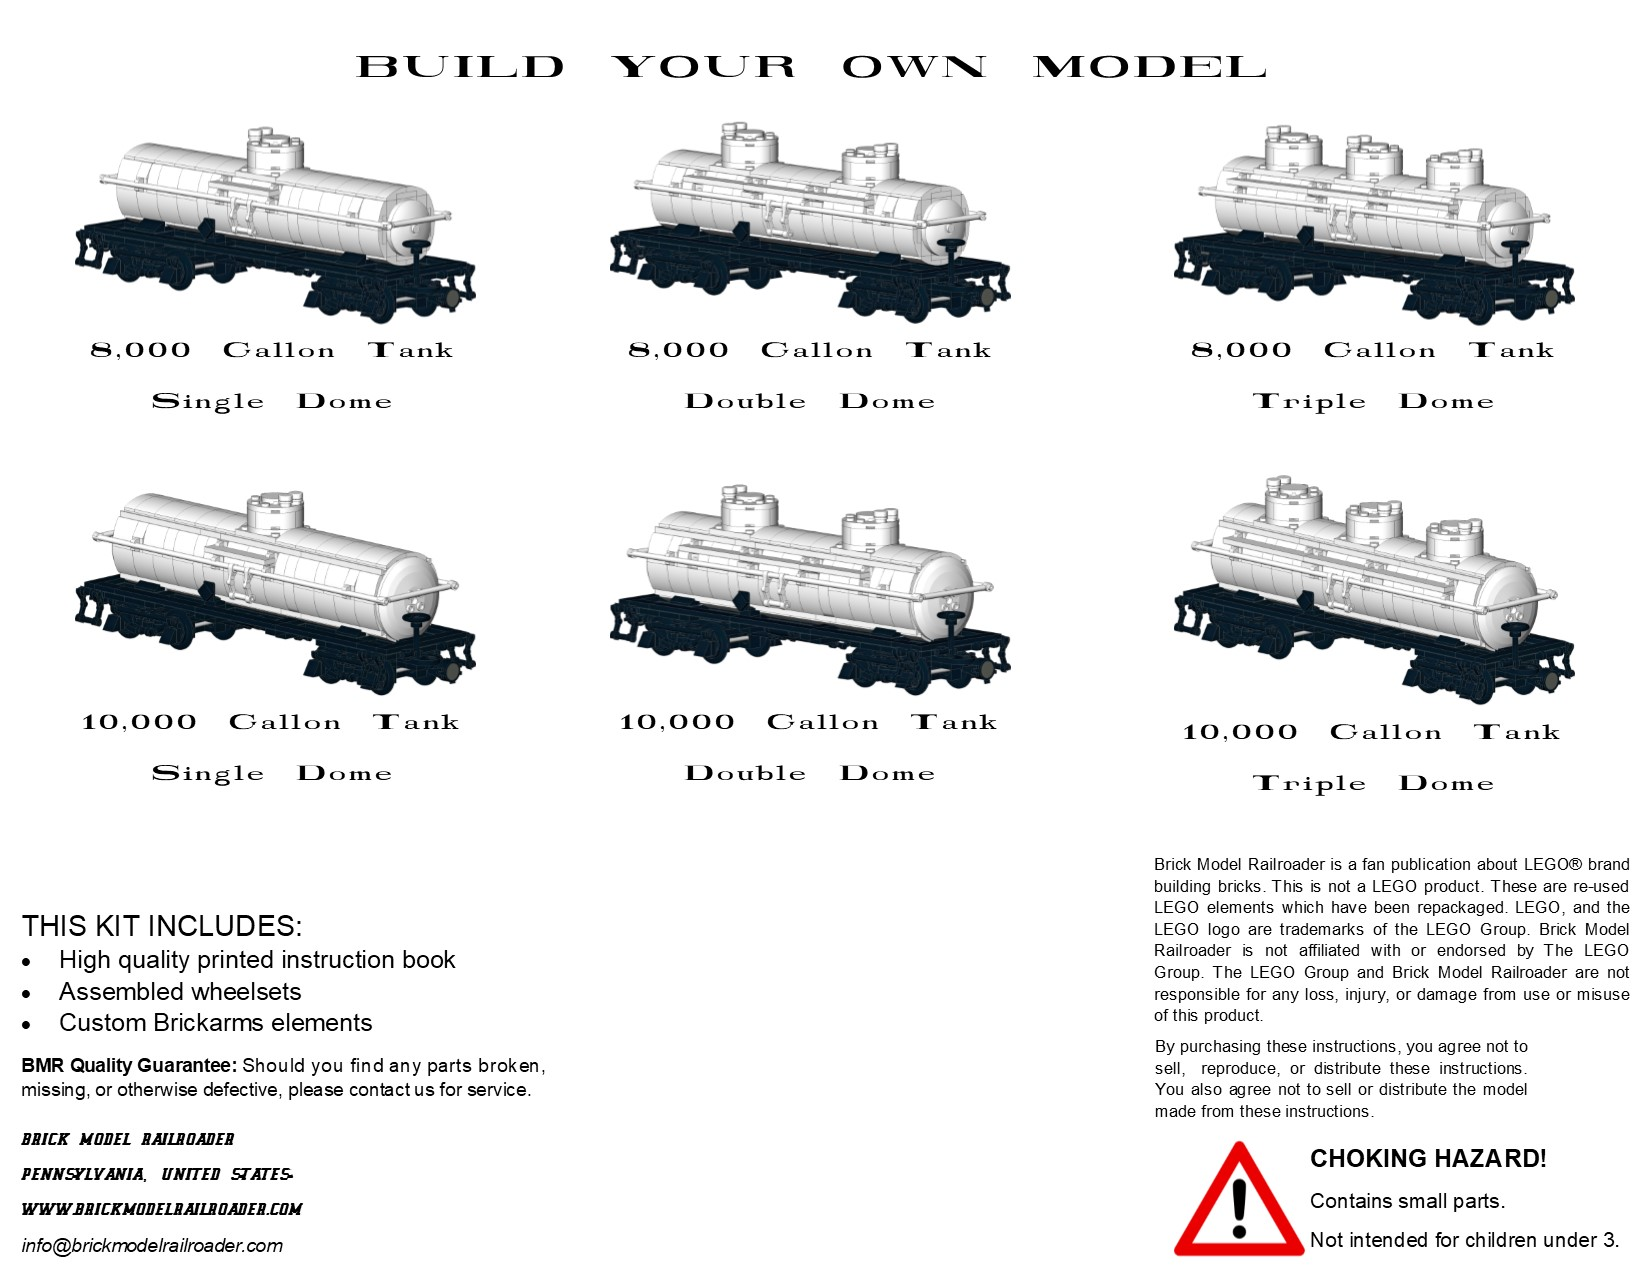 American Car & Foundry Type 27 Tank Car Premium Instructions | Brick ...